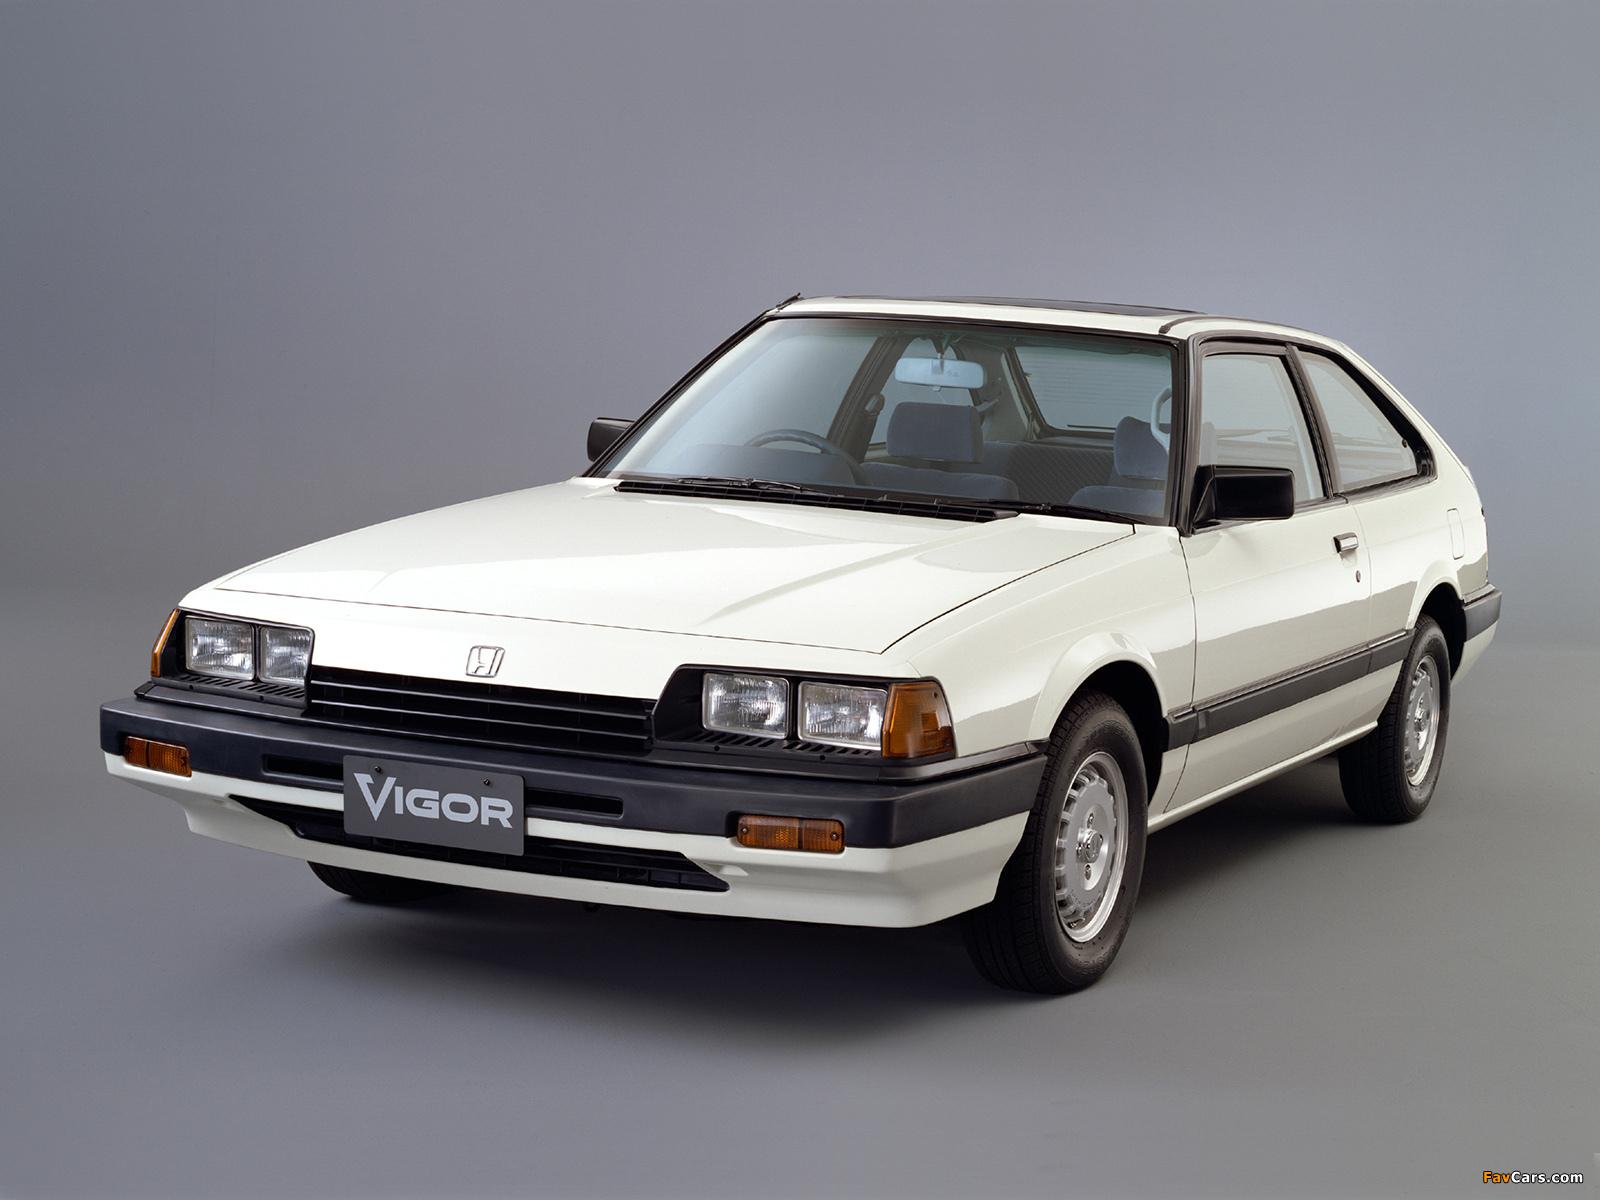 Honda Vigor Technical Specifications And Fuel Economy